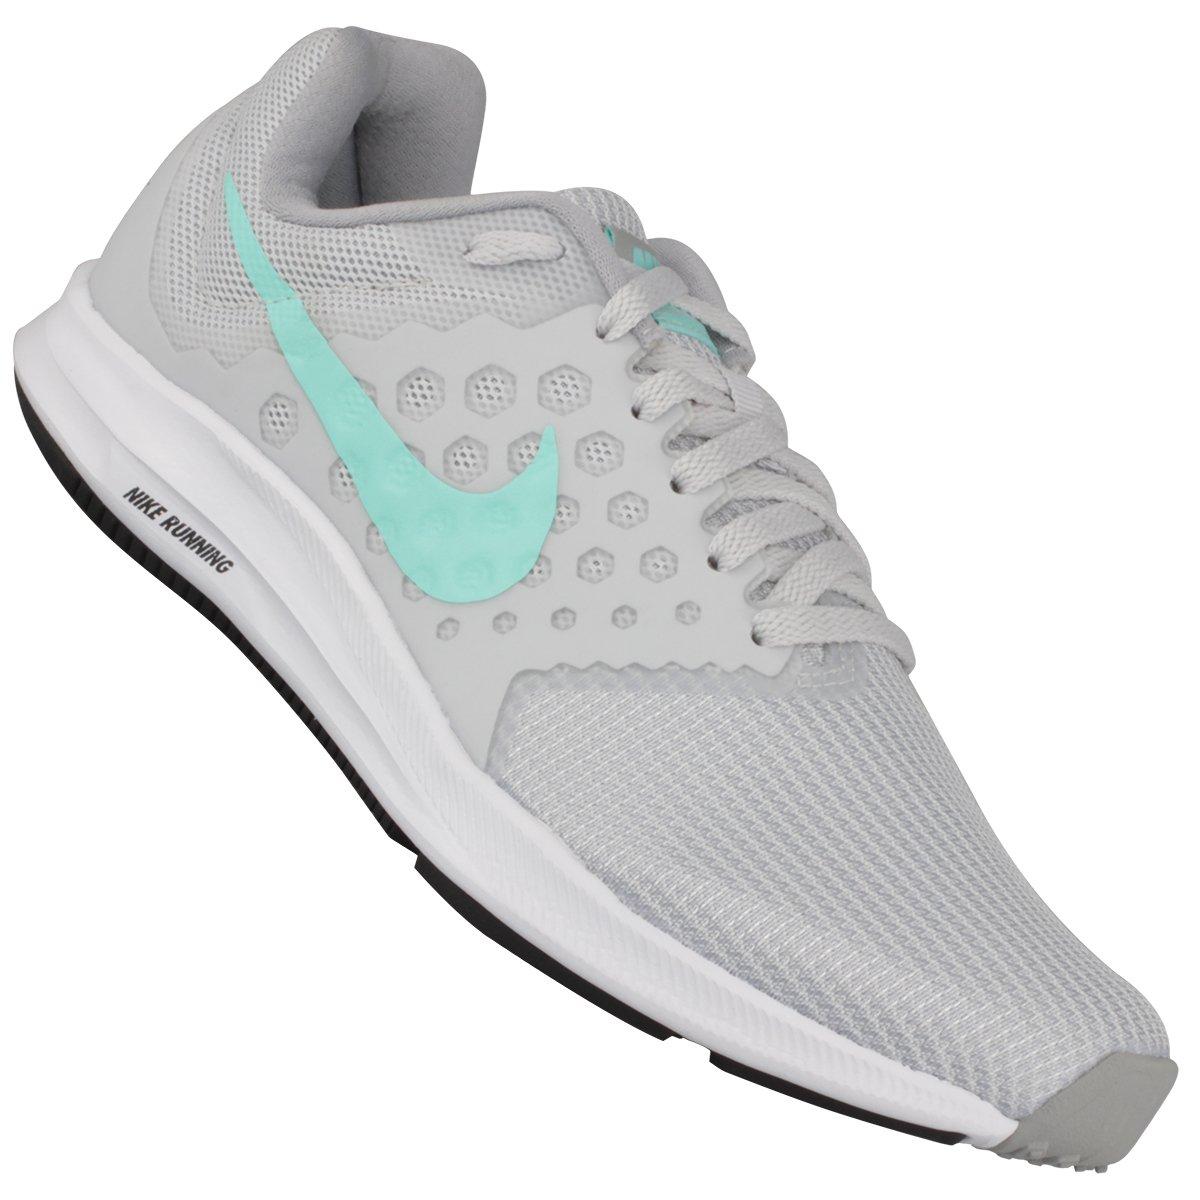 e8f4caffb70 Tênis Nike Downshifter 7 Feminino